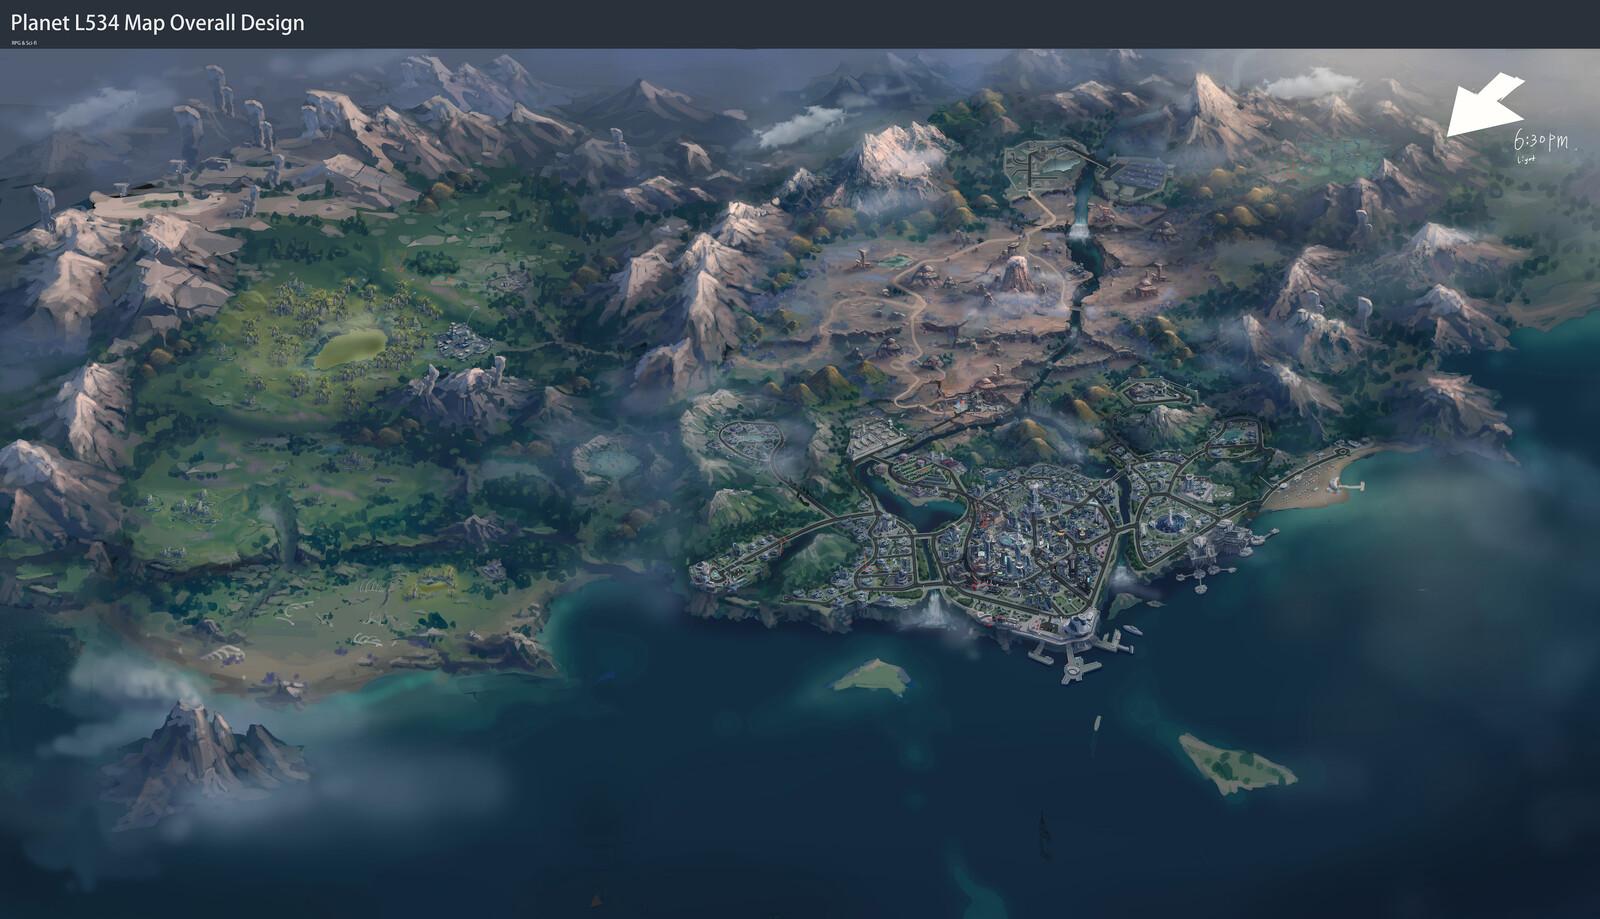 Scifi_RPG_L534 Map Design